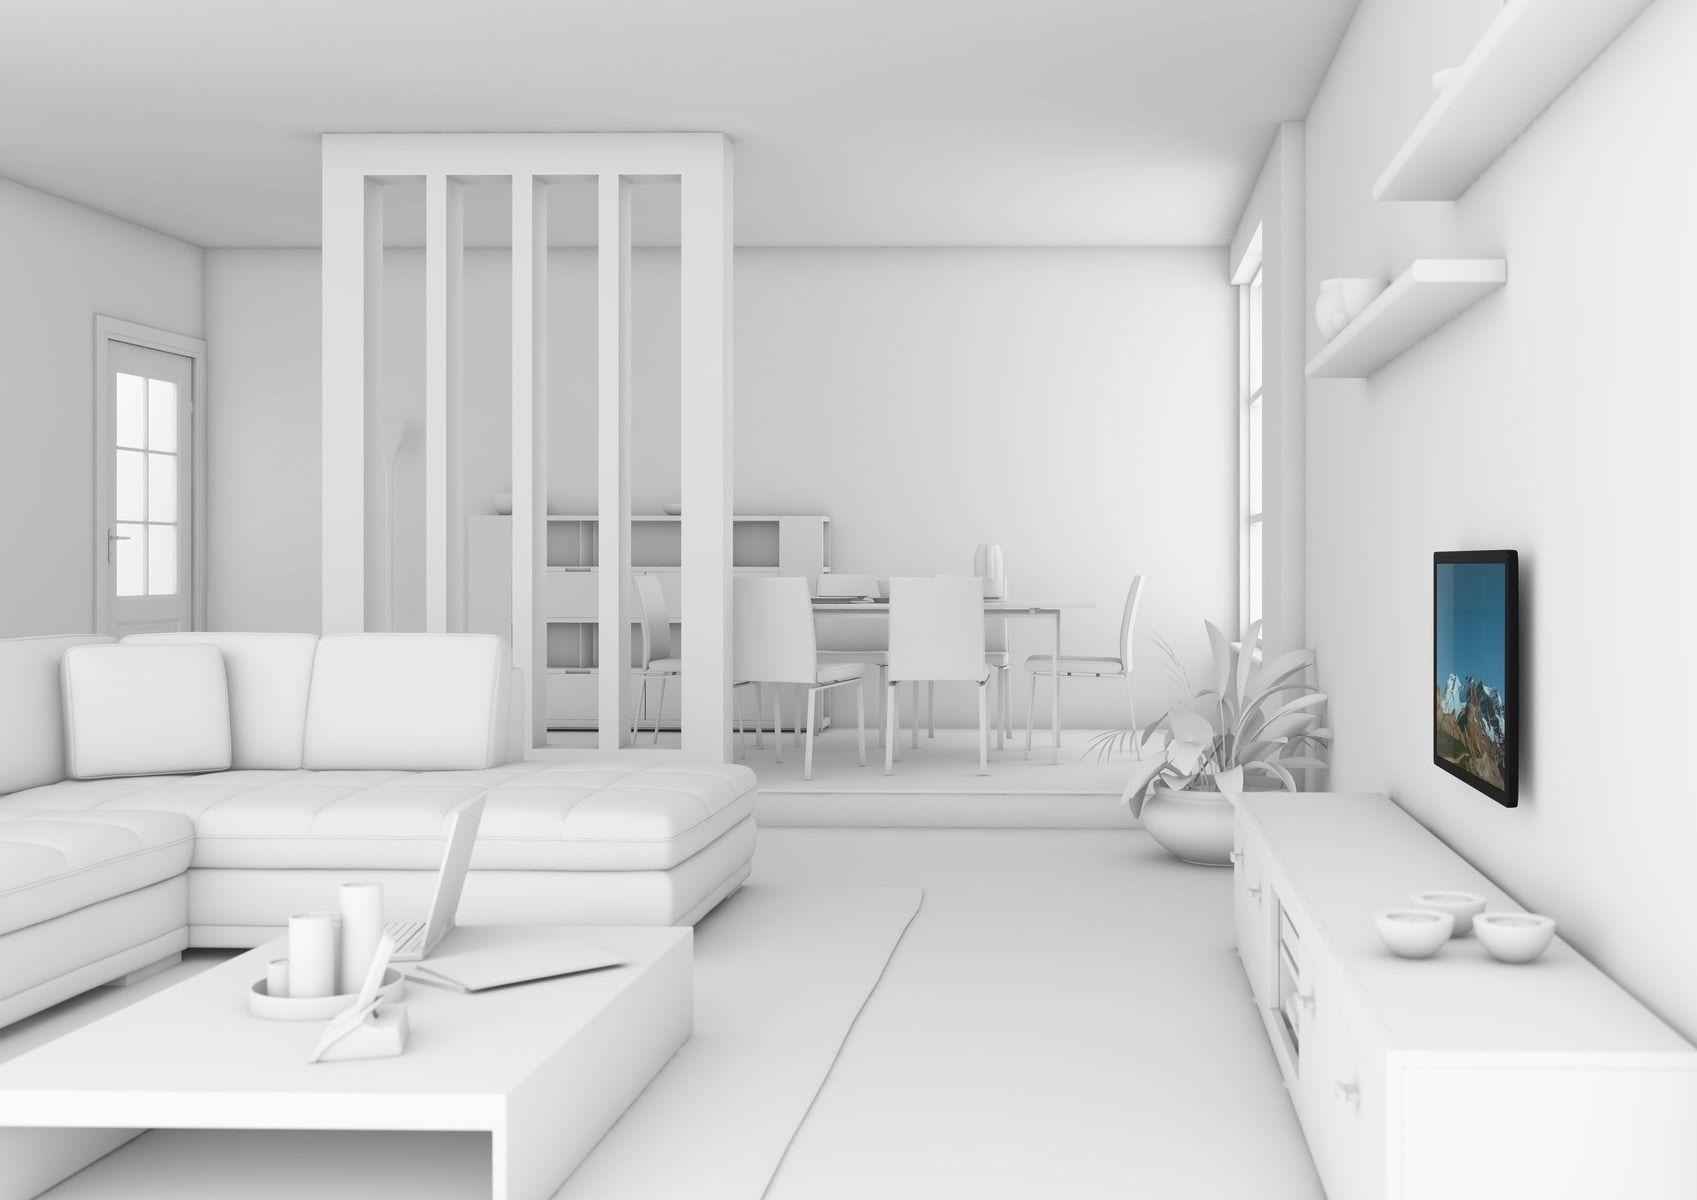 Ambiance product image